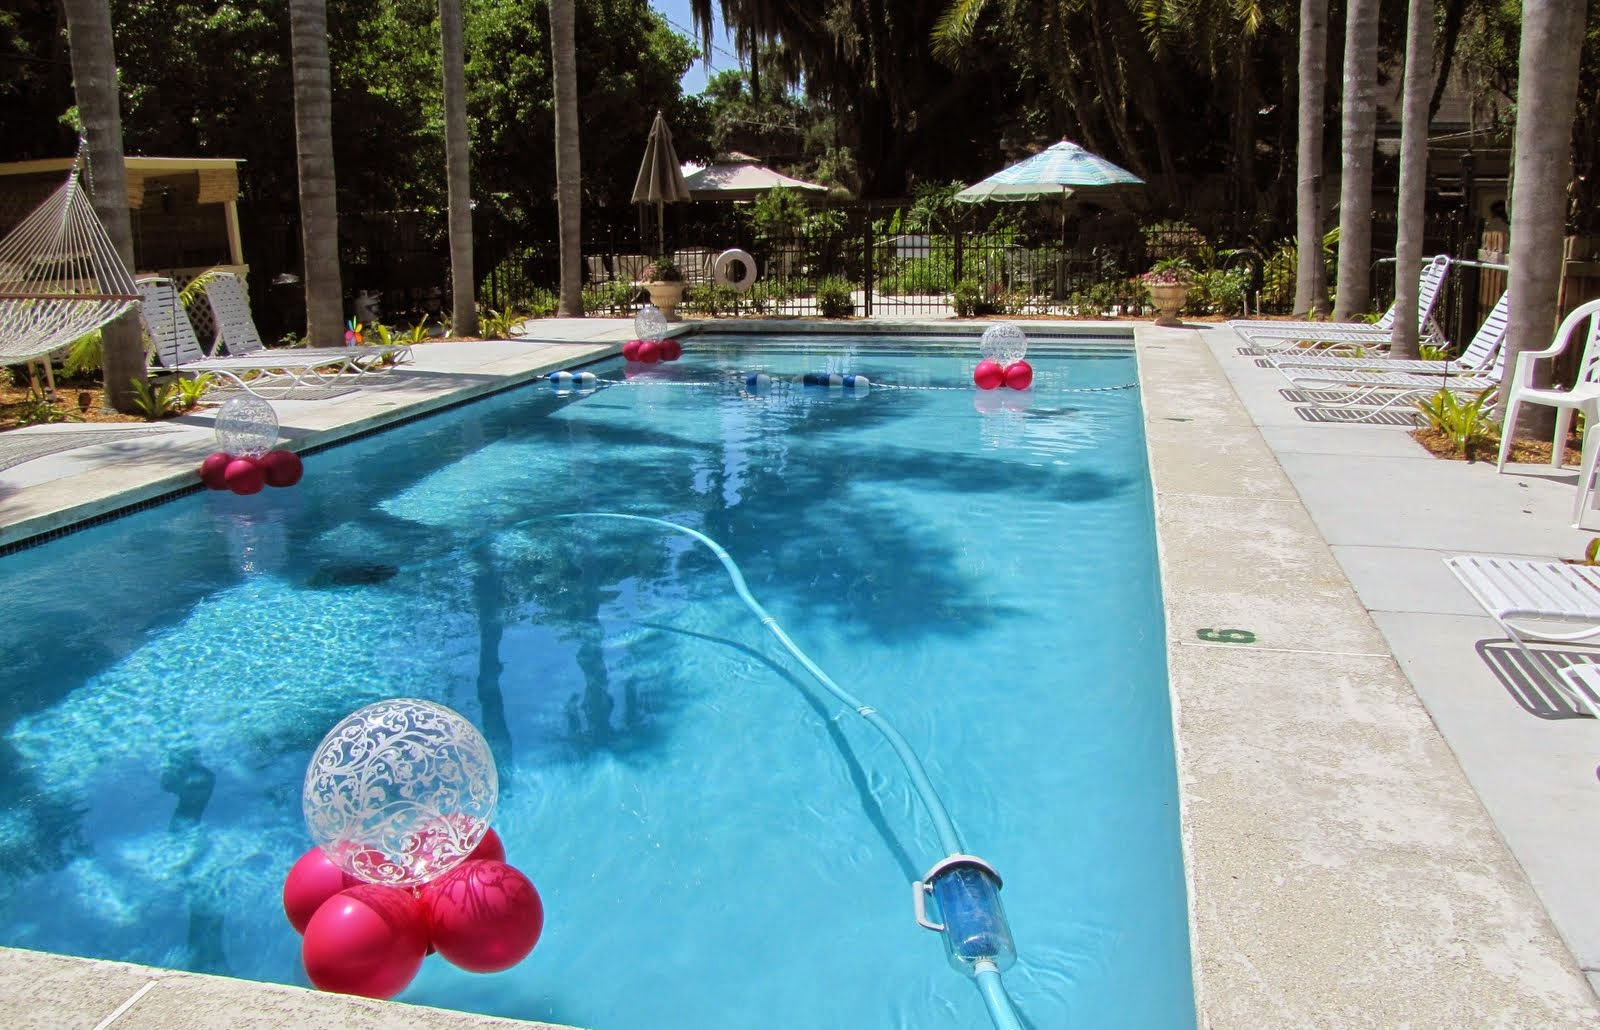 Pool Decorations Celebration